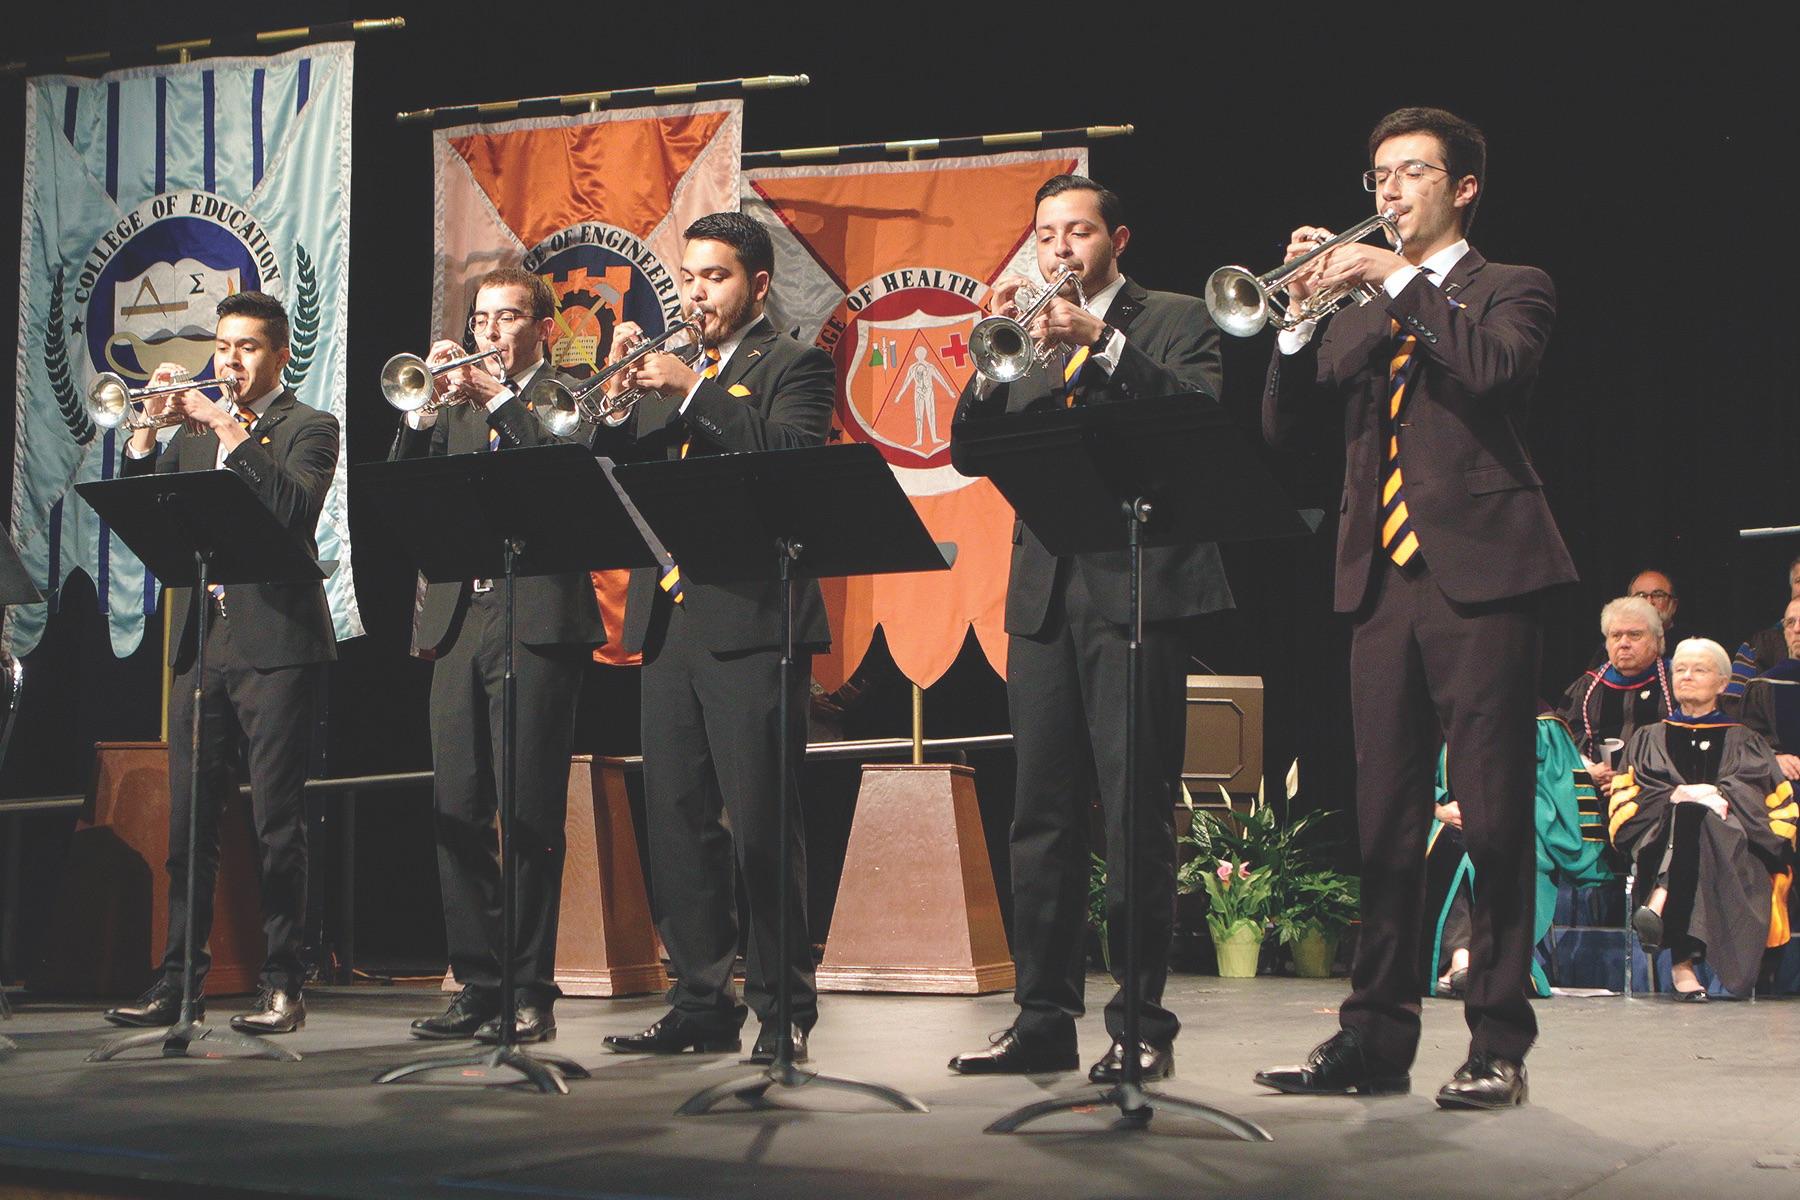 The recipients are, from left:Elijah Ontiveros, Jacob Aun,Pablo Palacios, Isaac Ponce and Paul Reid.